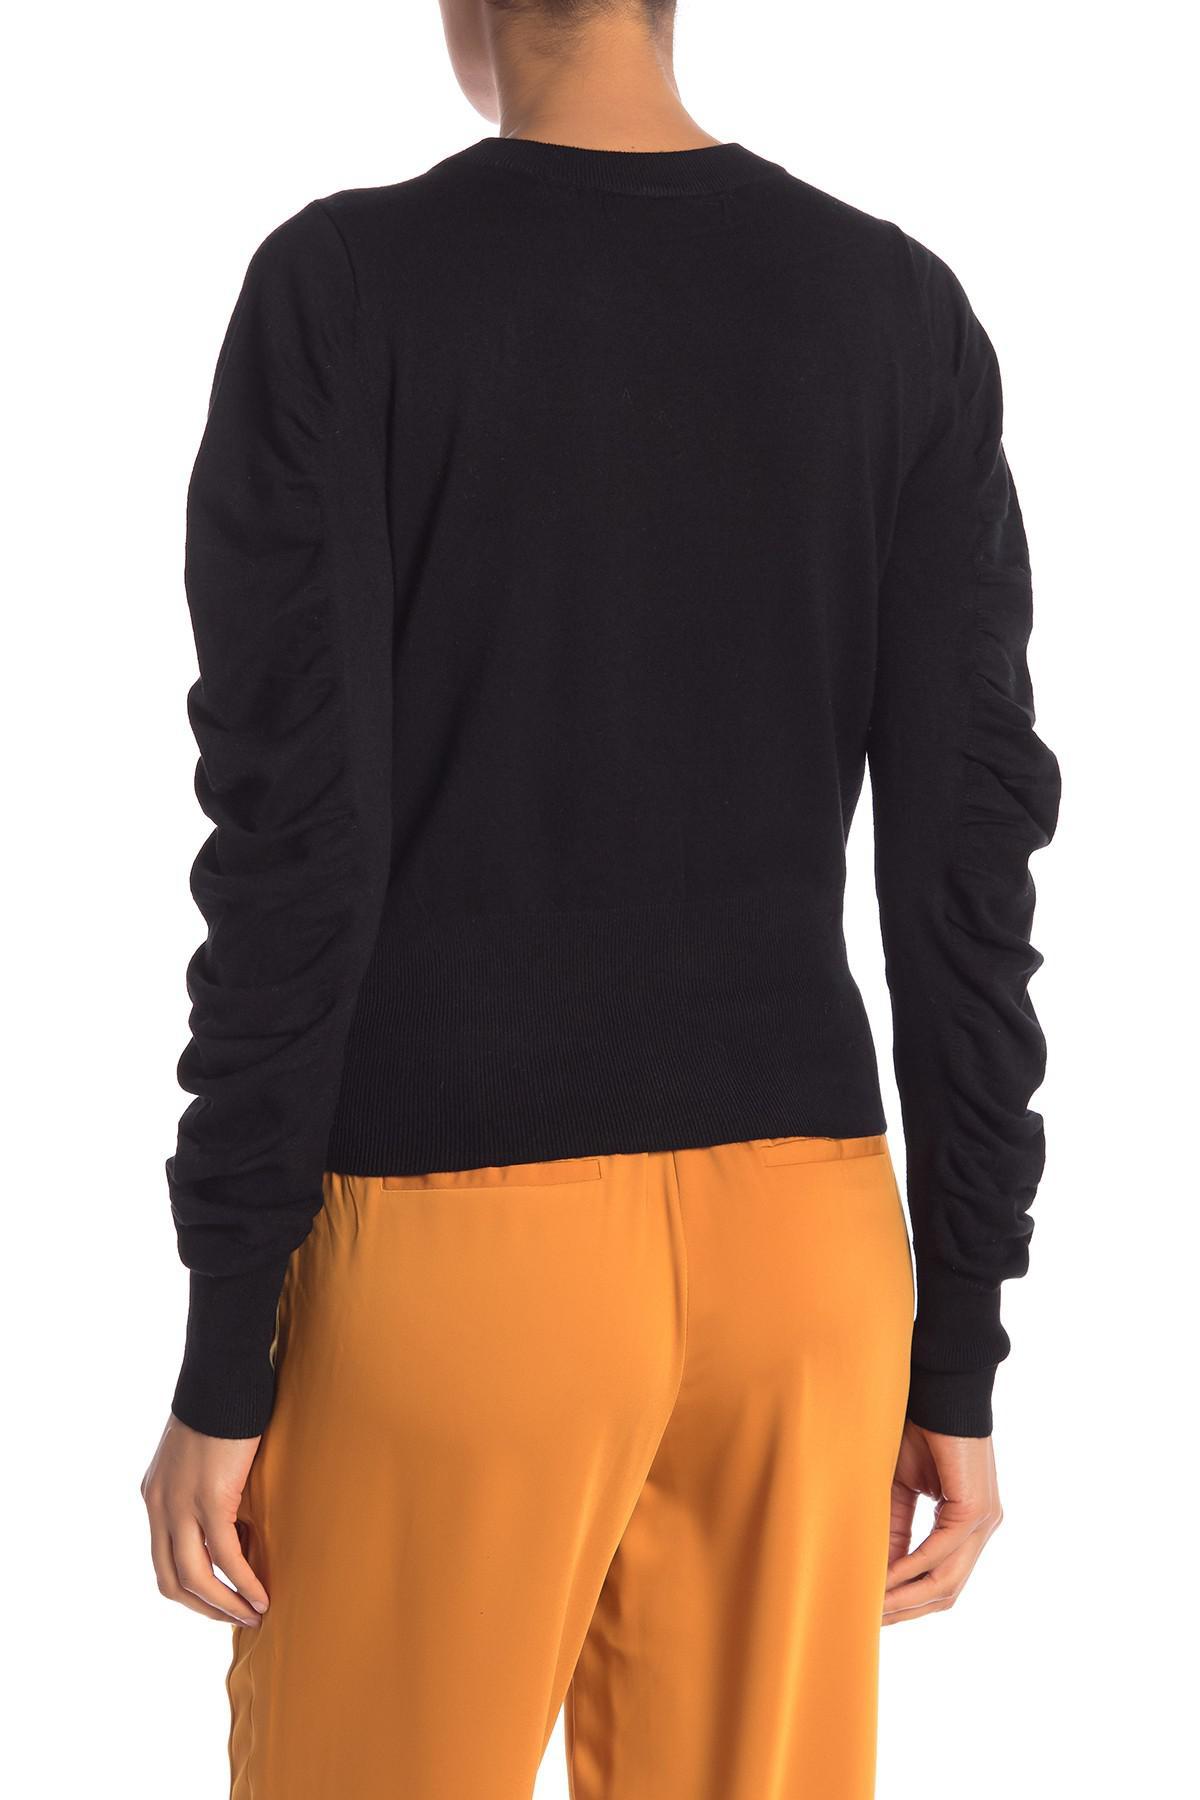 Vero Moda - Black Gathered Sleeve Knit Sweater - Lyst. View fullscreen 30c919ad0ac3